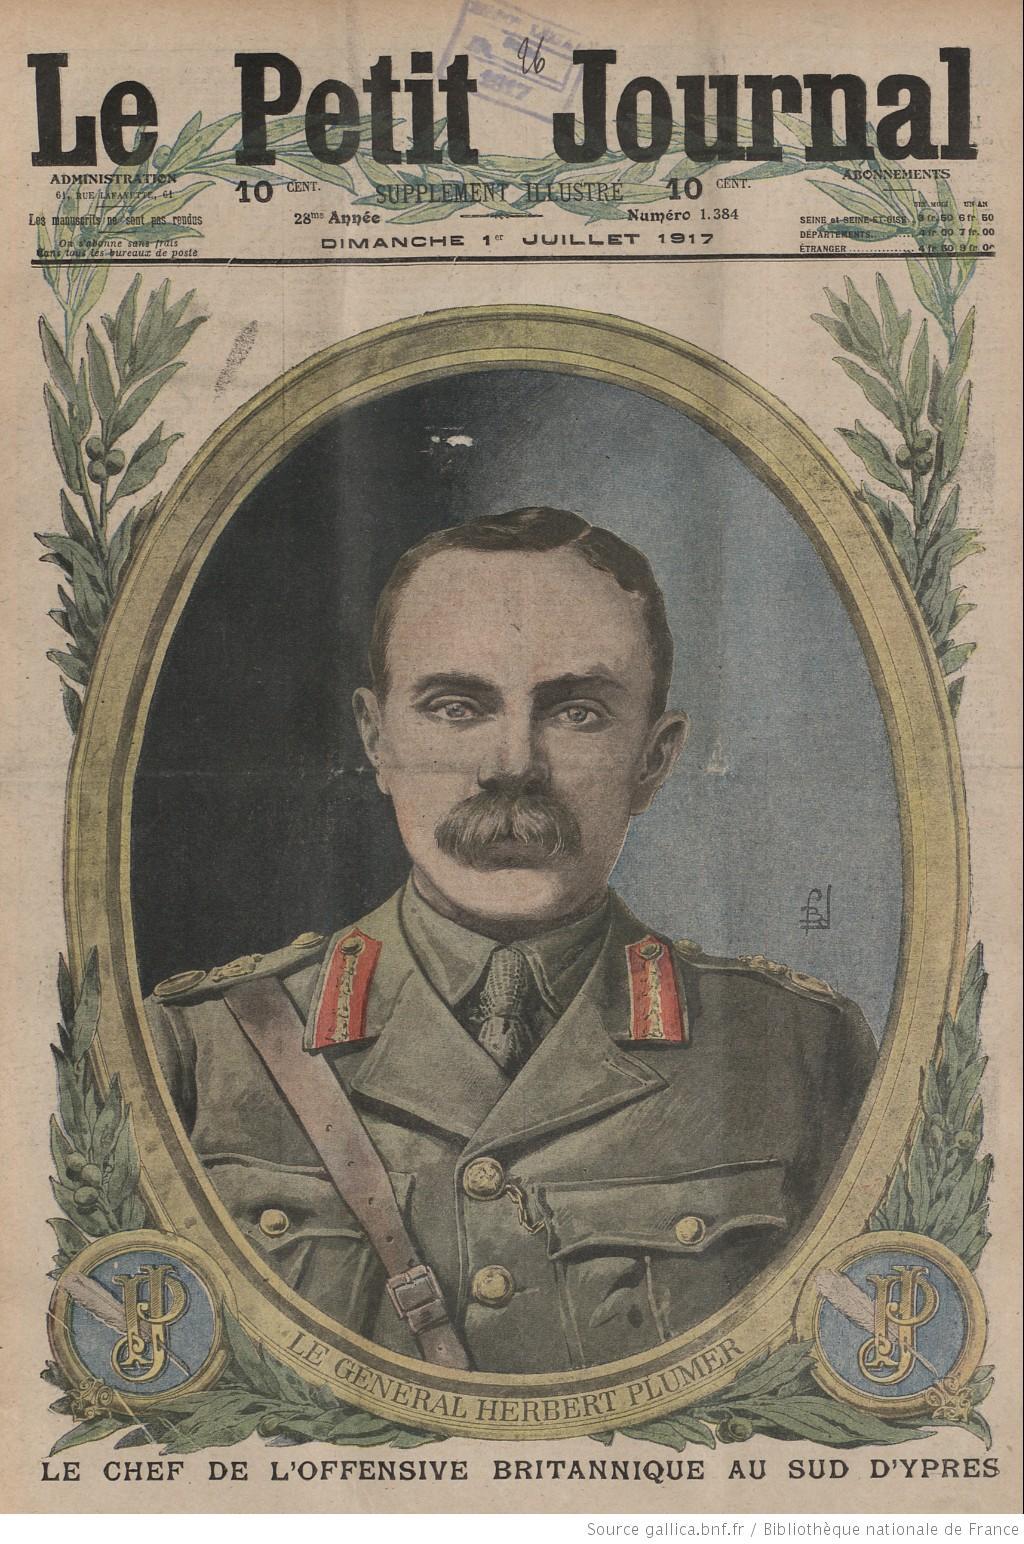 LPJ Illustre 1917-07-01 A.jpg